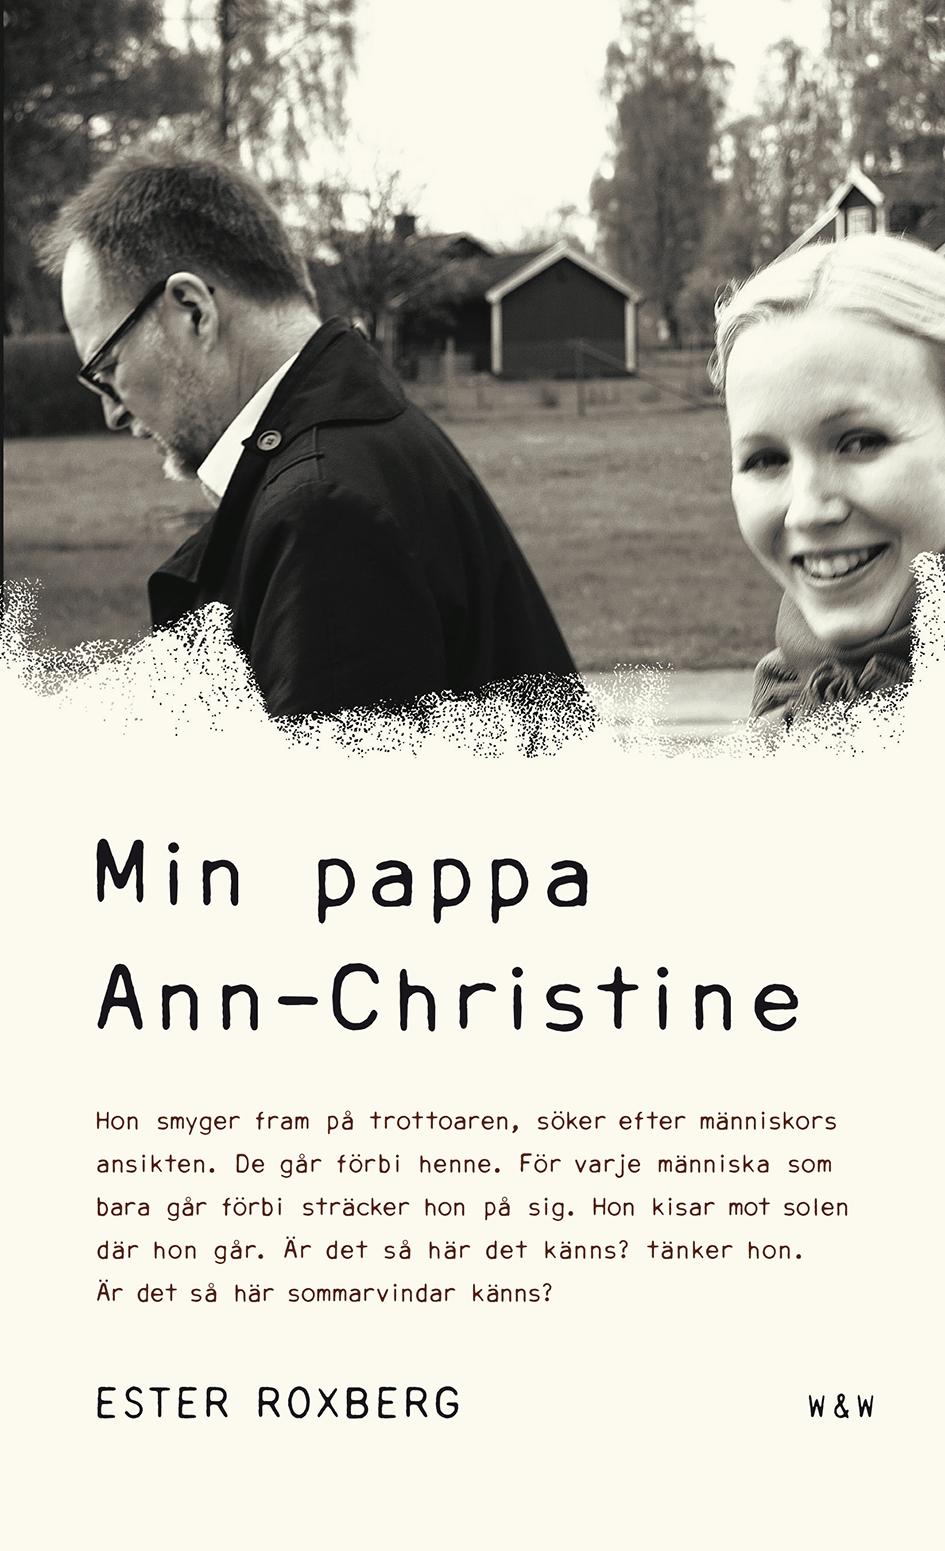 Min Pappa Ann-Christine, Ester Roxberg